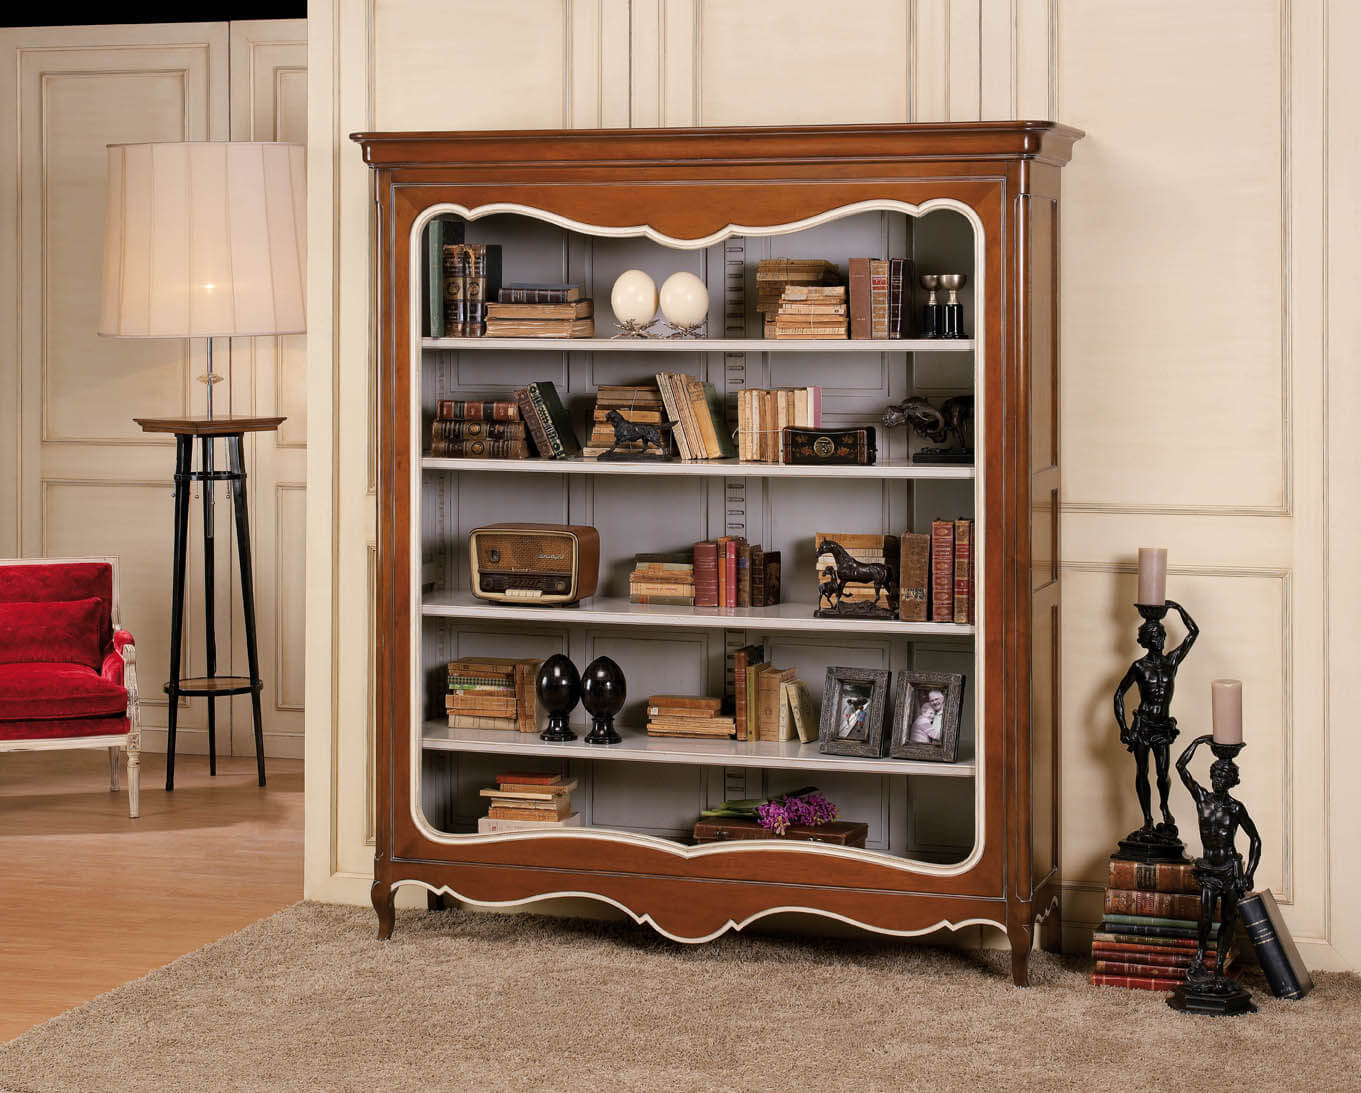 b cherregal malte ph nix sch ner leben. Black Bedroom Furniture Sets. Home Design Ideas